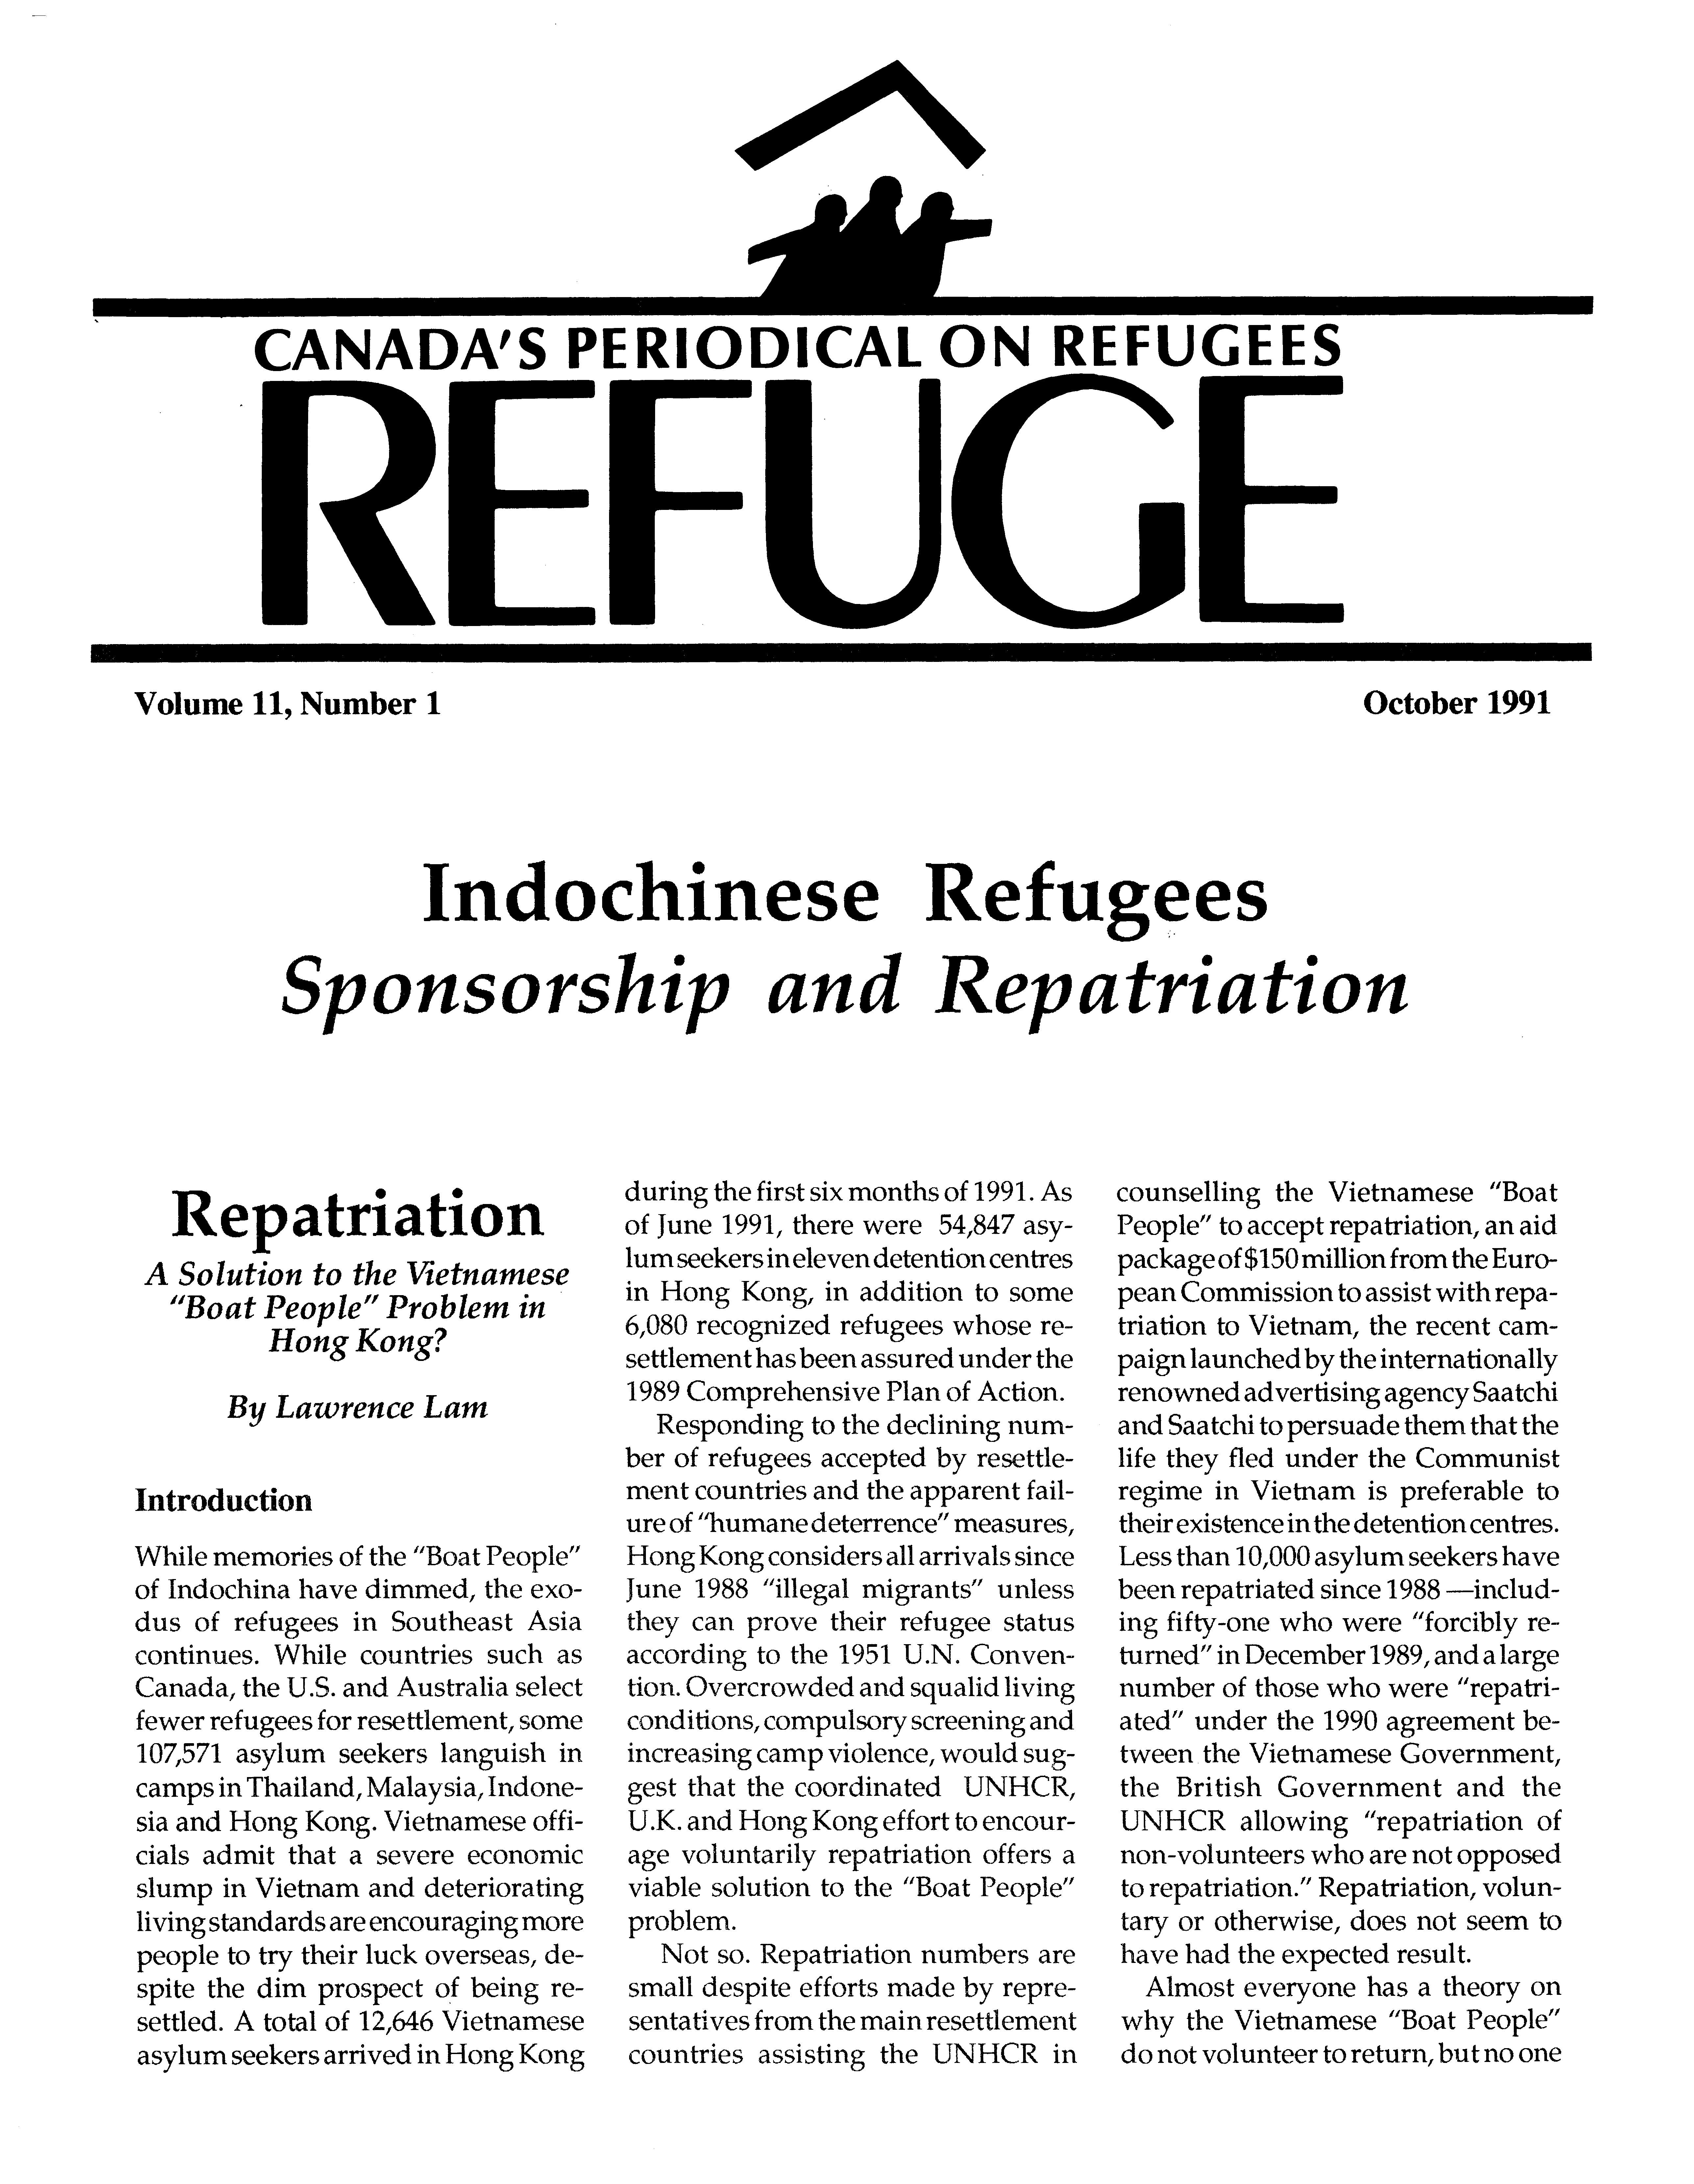 first page Refuge vol. 11.1 1991